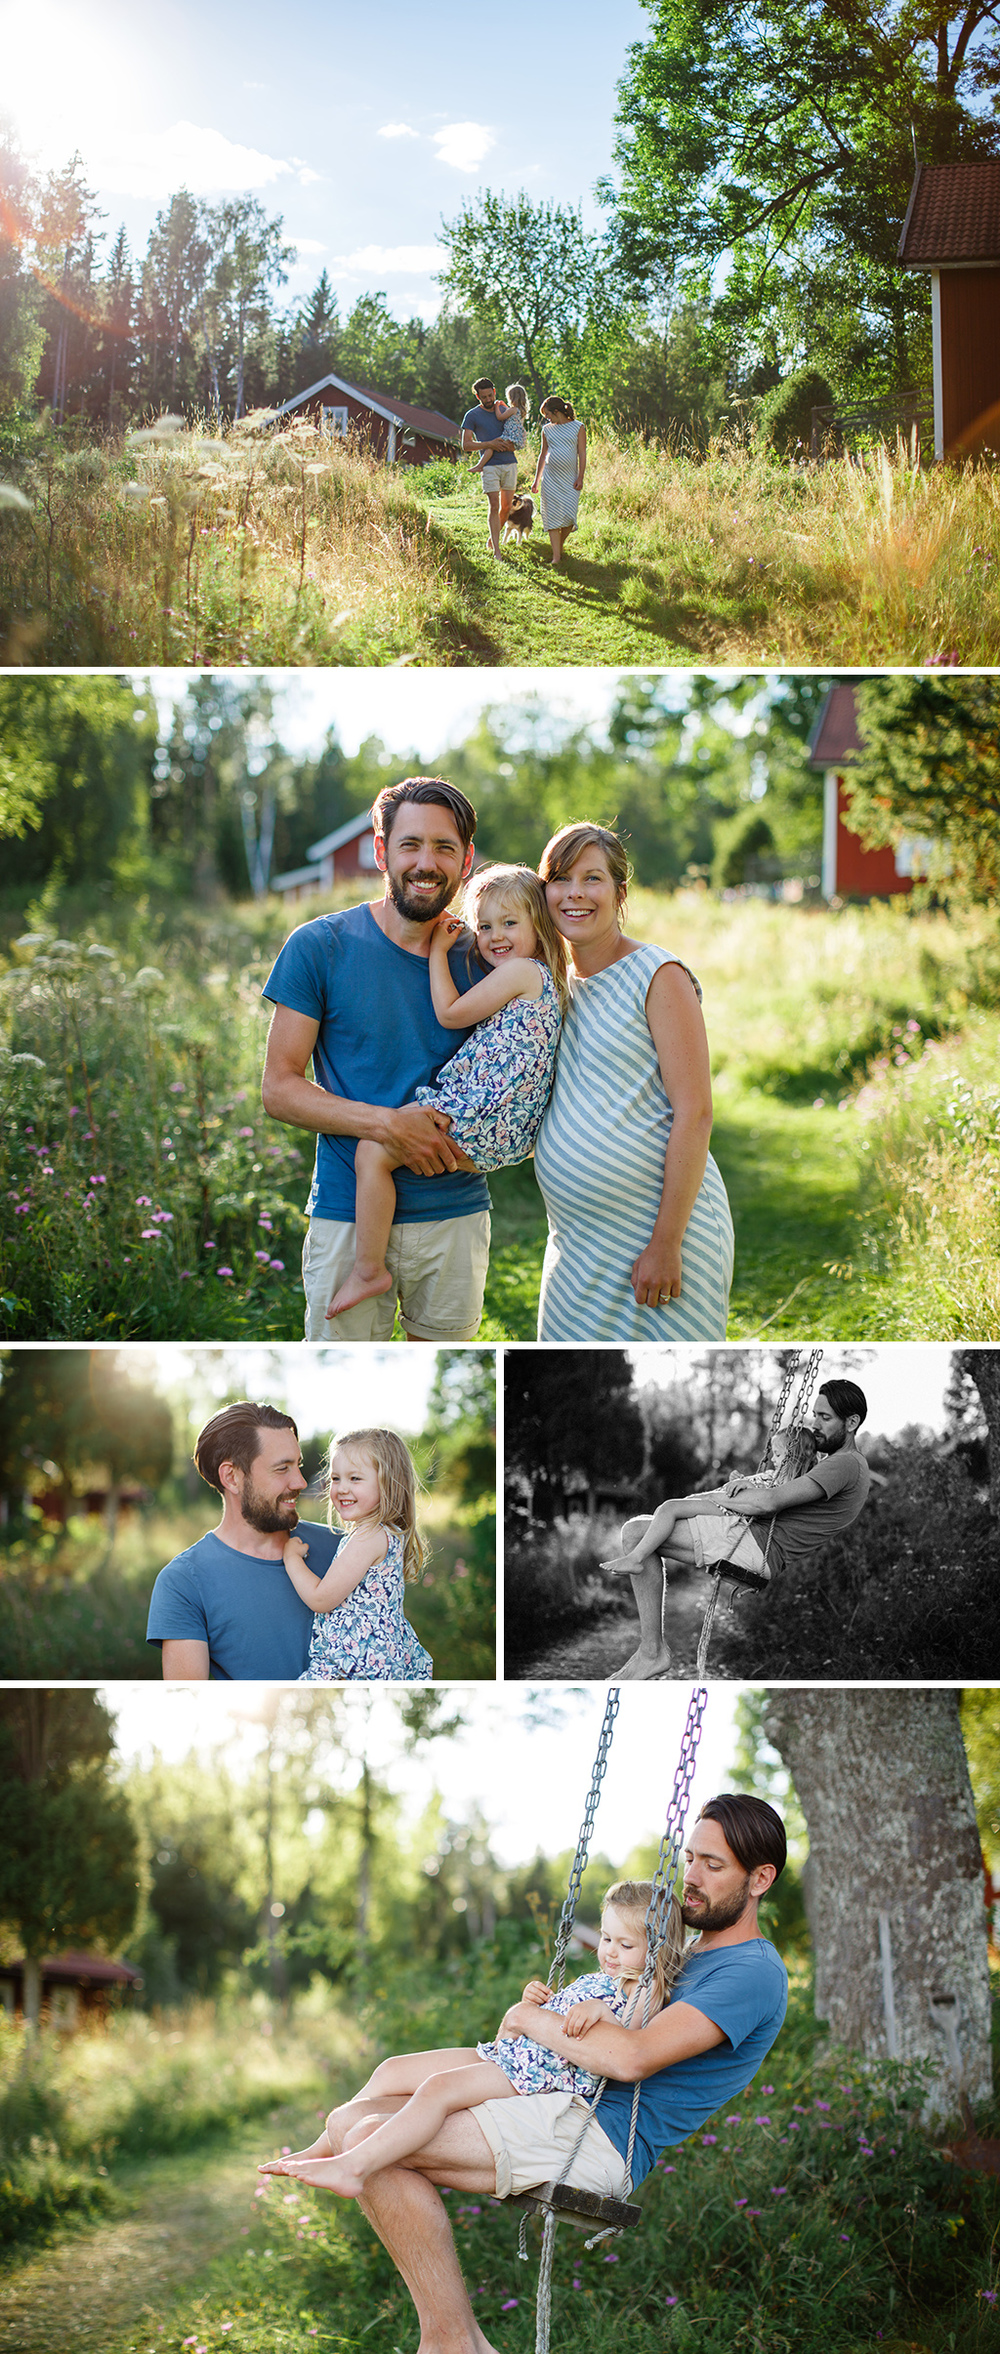 Lifestyle-familjefotografering_Familjefotograf-Anna-Sandstrom-5.jpg